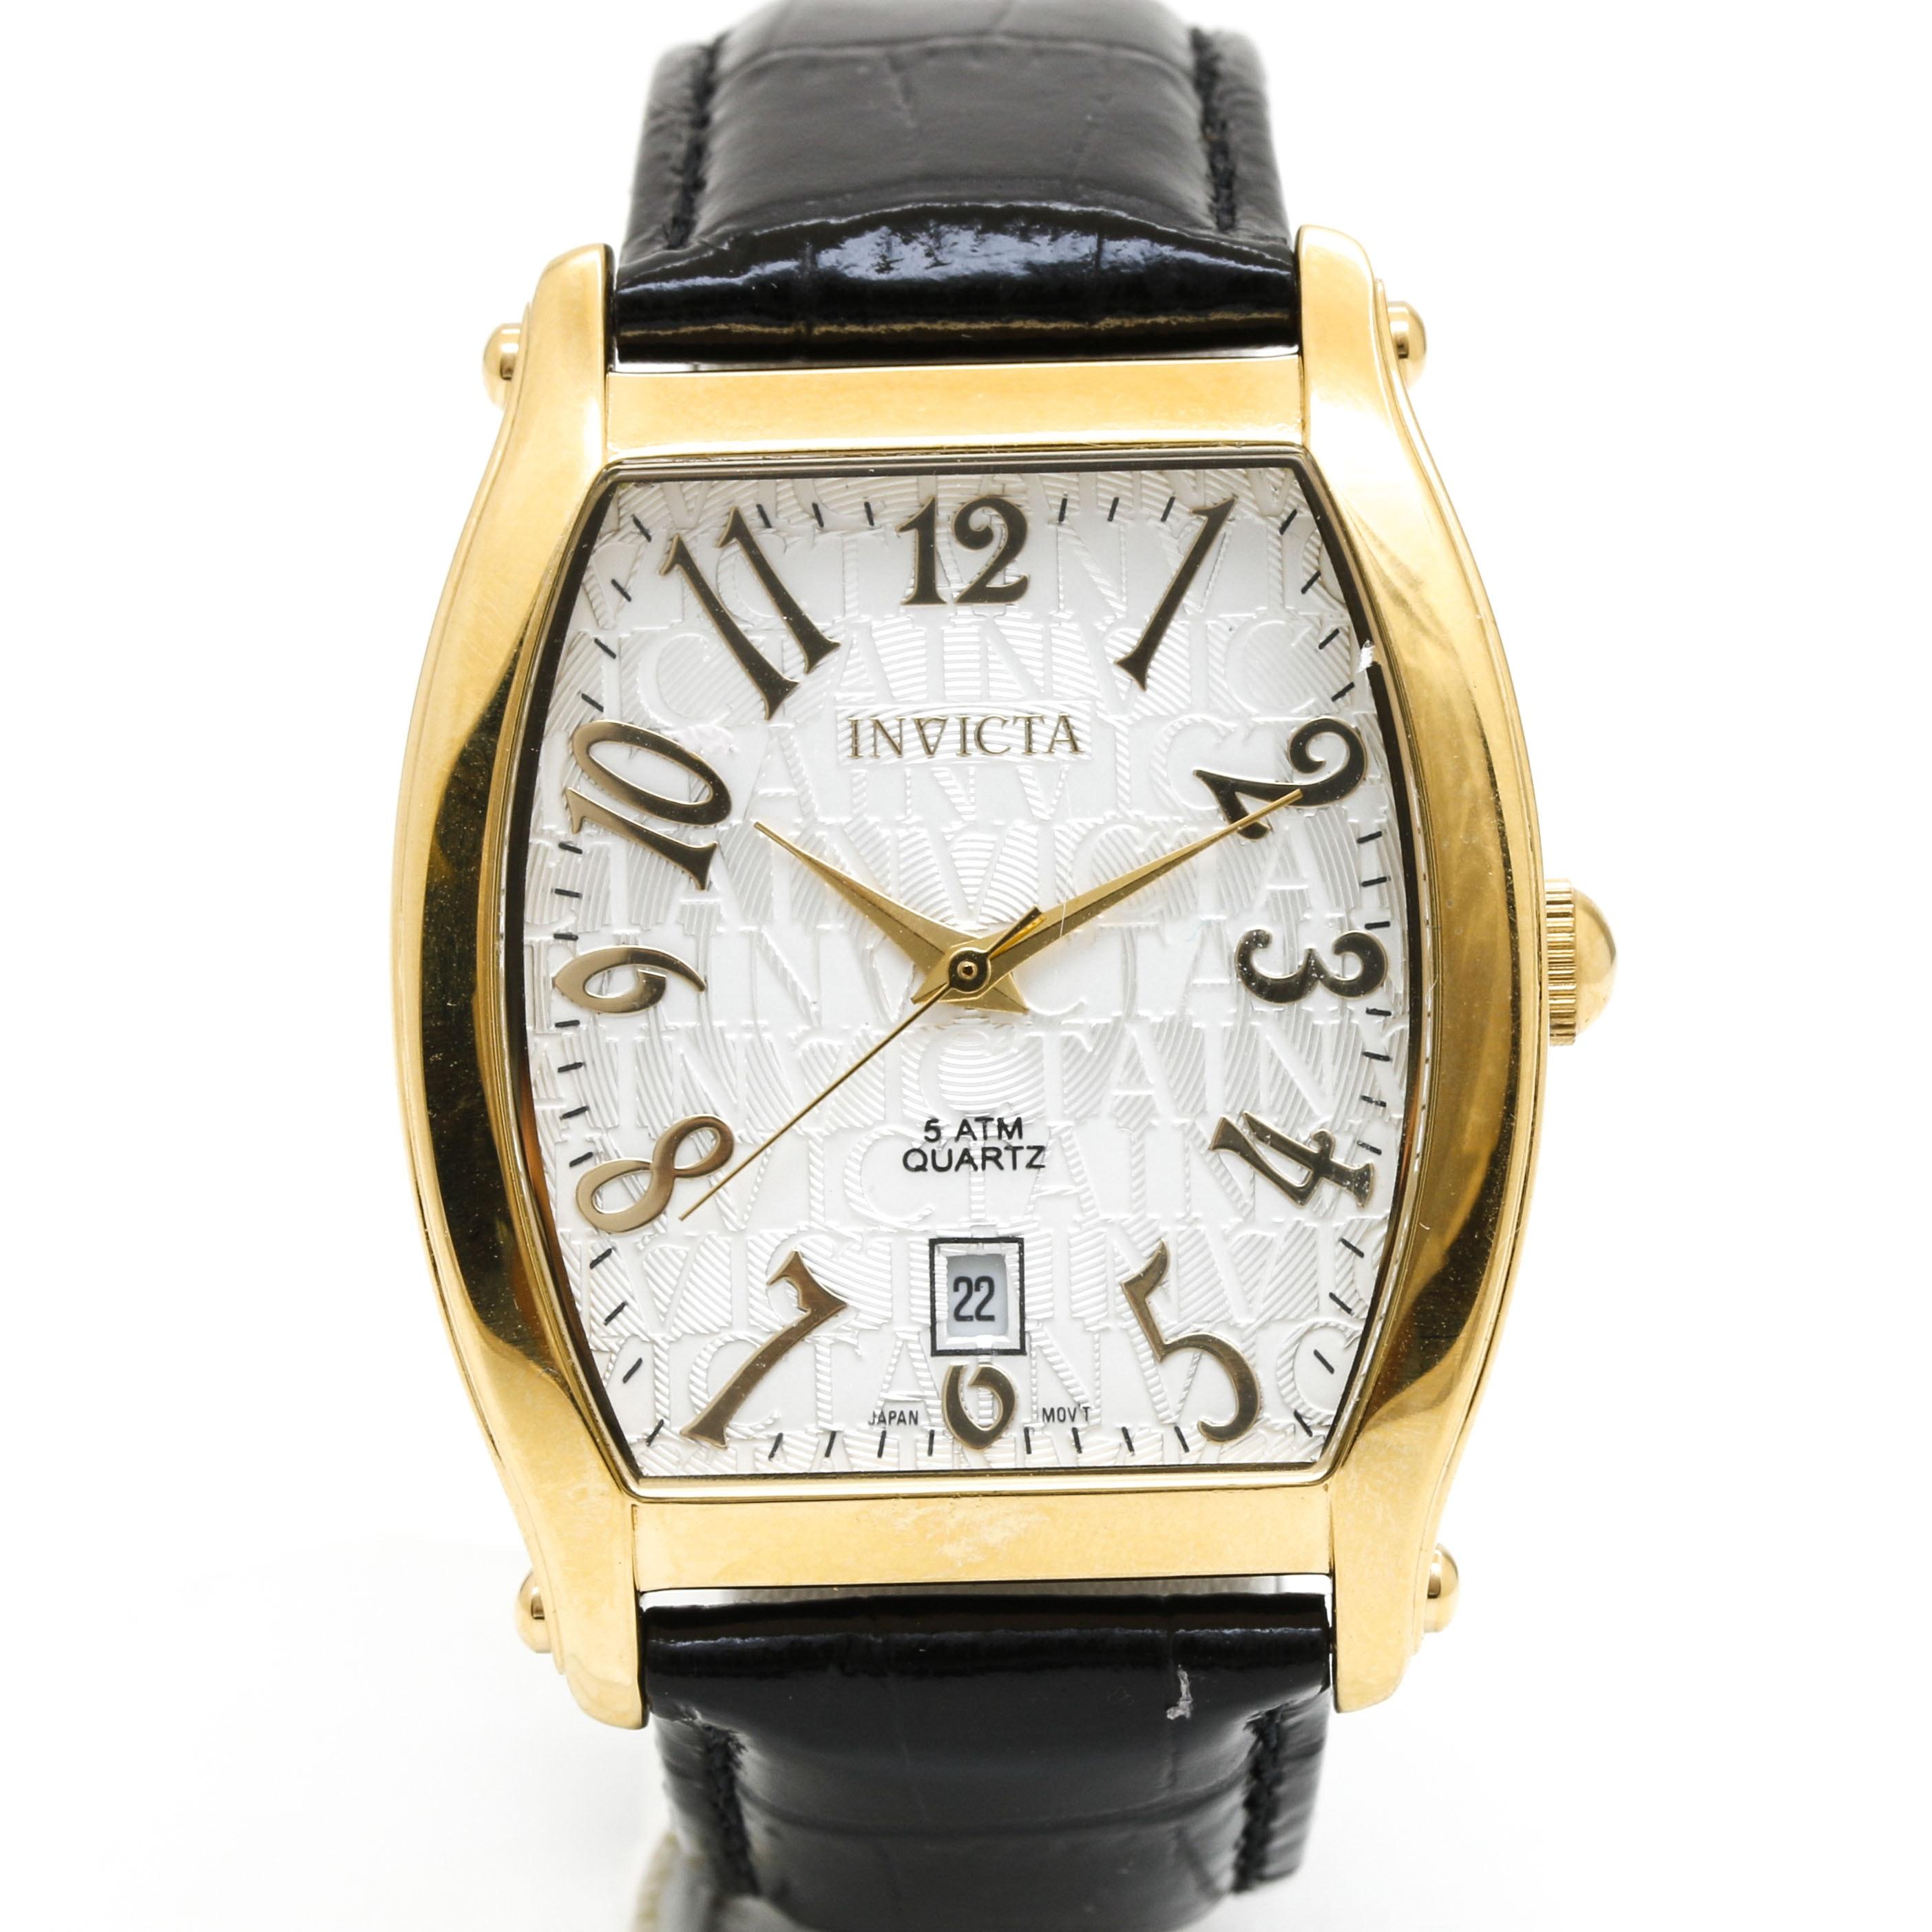 Stainless Steel Invicta Wristwatch